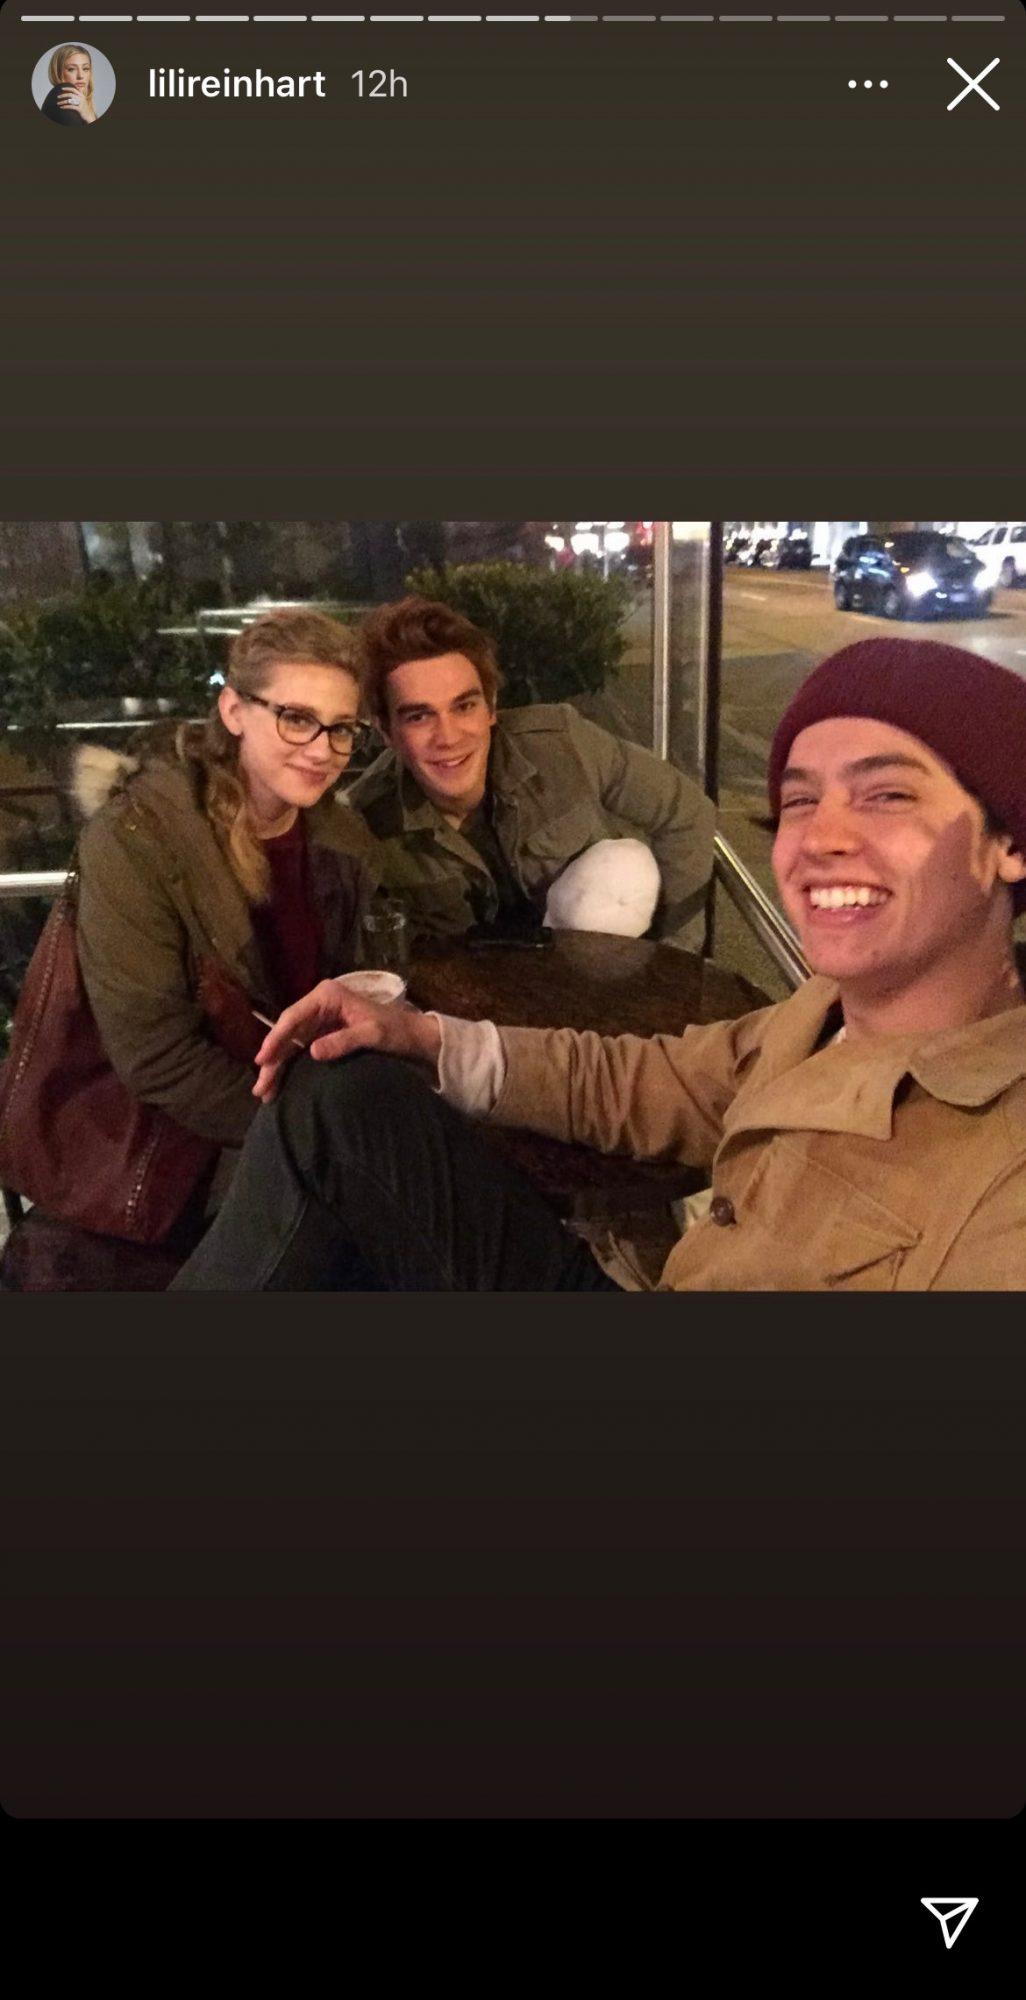 Lili Reinhart, KJ Apa, and Cole Sprouse on Riverdale